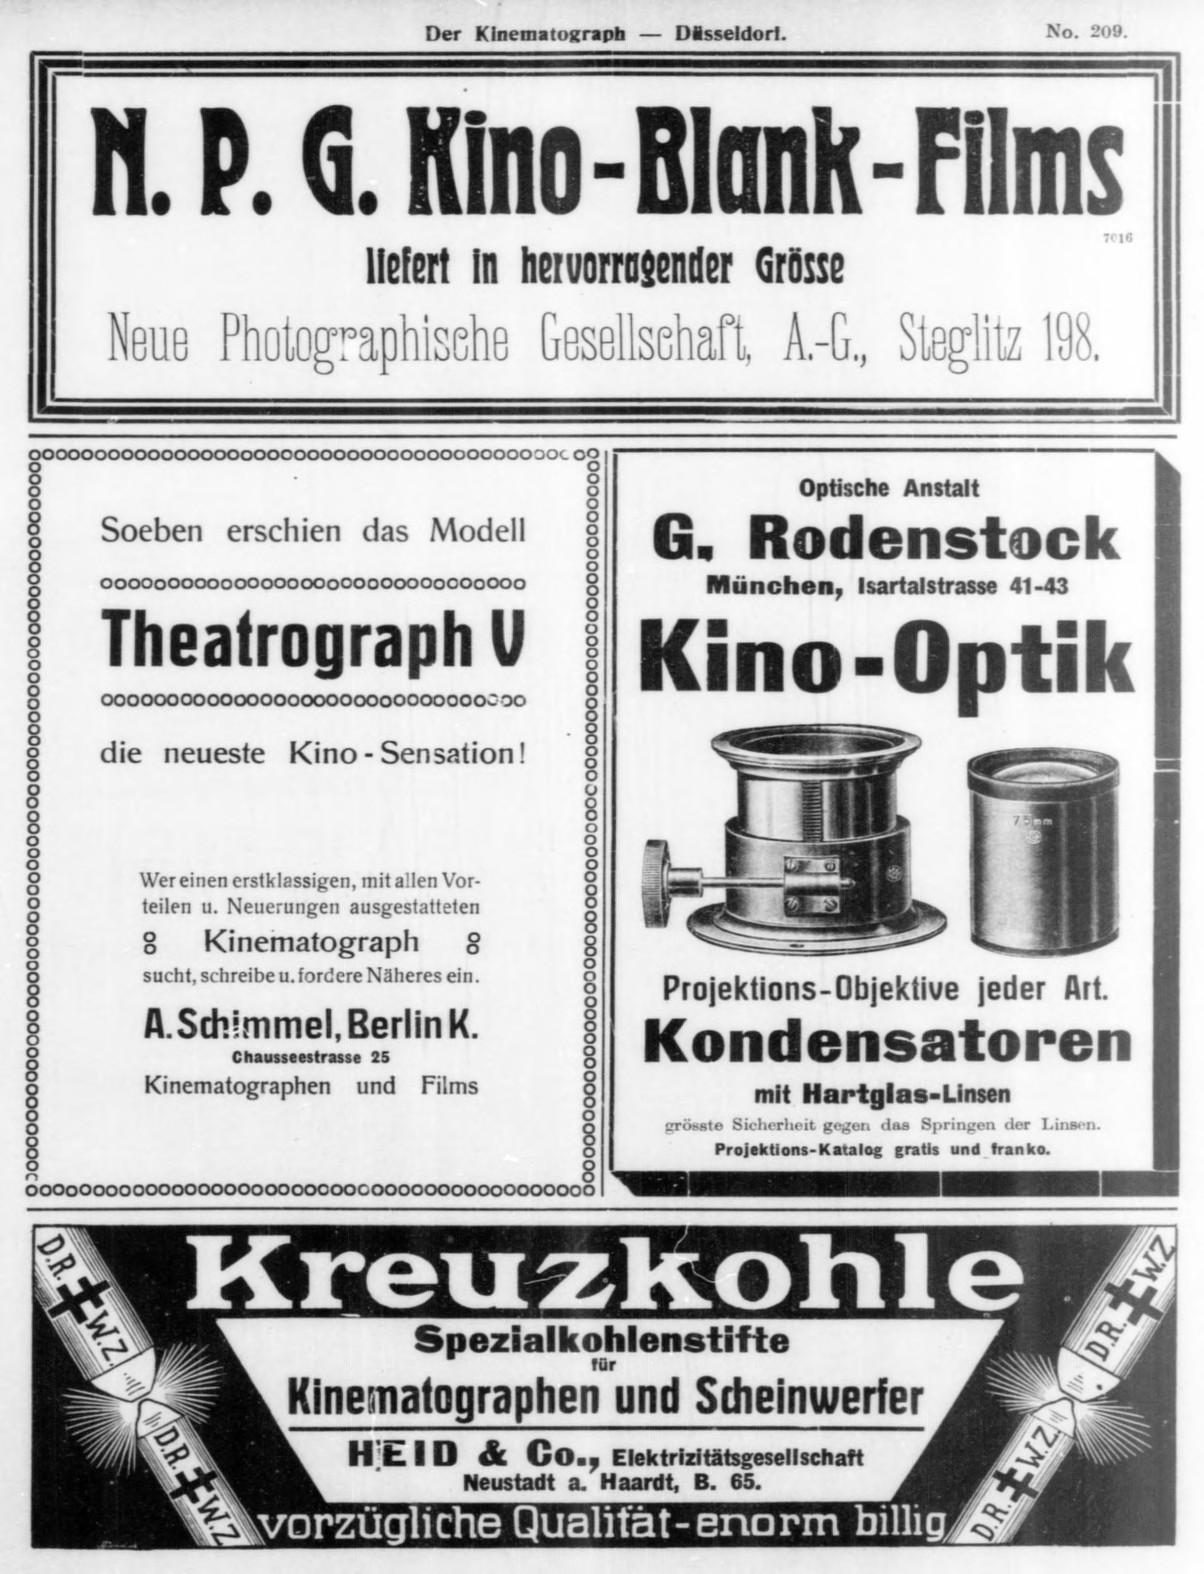 Kinematograph04-1910-12_jp2.zip&file=kinematograph04-1910-12_jp2%2fkinematograph04-1910-12_0102